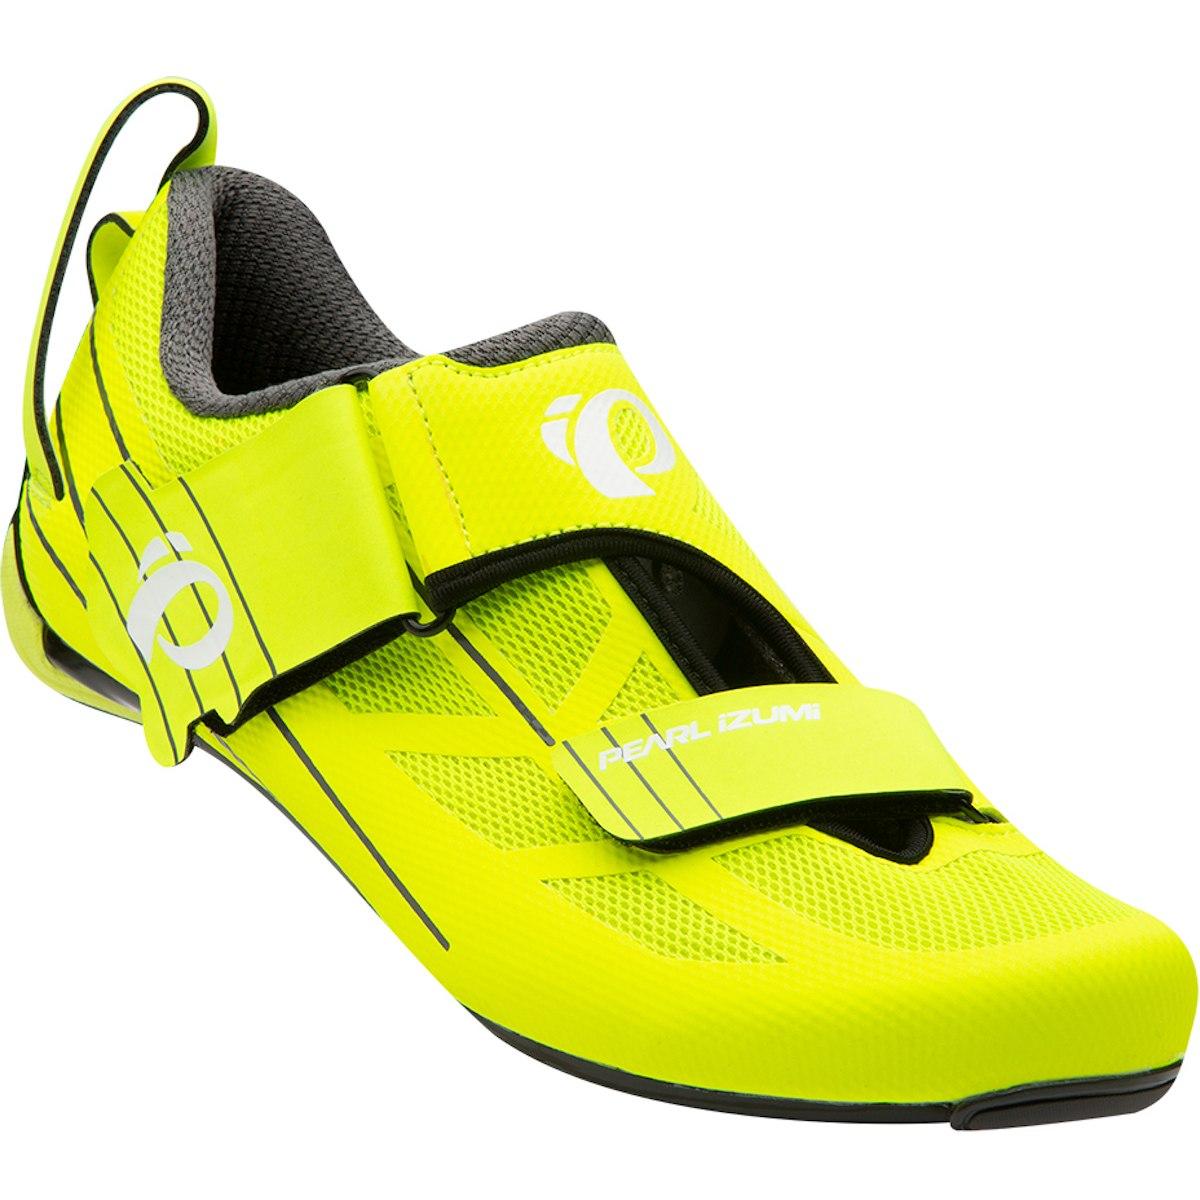 Produktbild von PEARL iZUMi Men's Tri Fly SELECT v6 Triathlonschuh 15117003 - screaming yellow / black 429